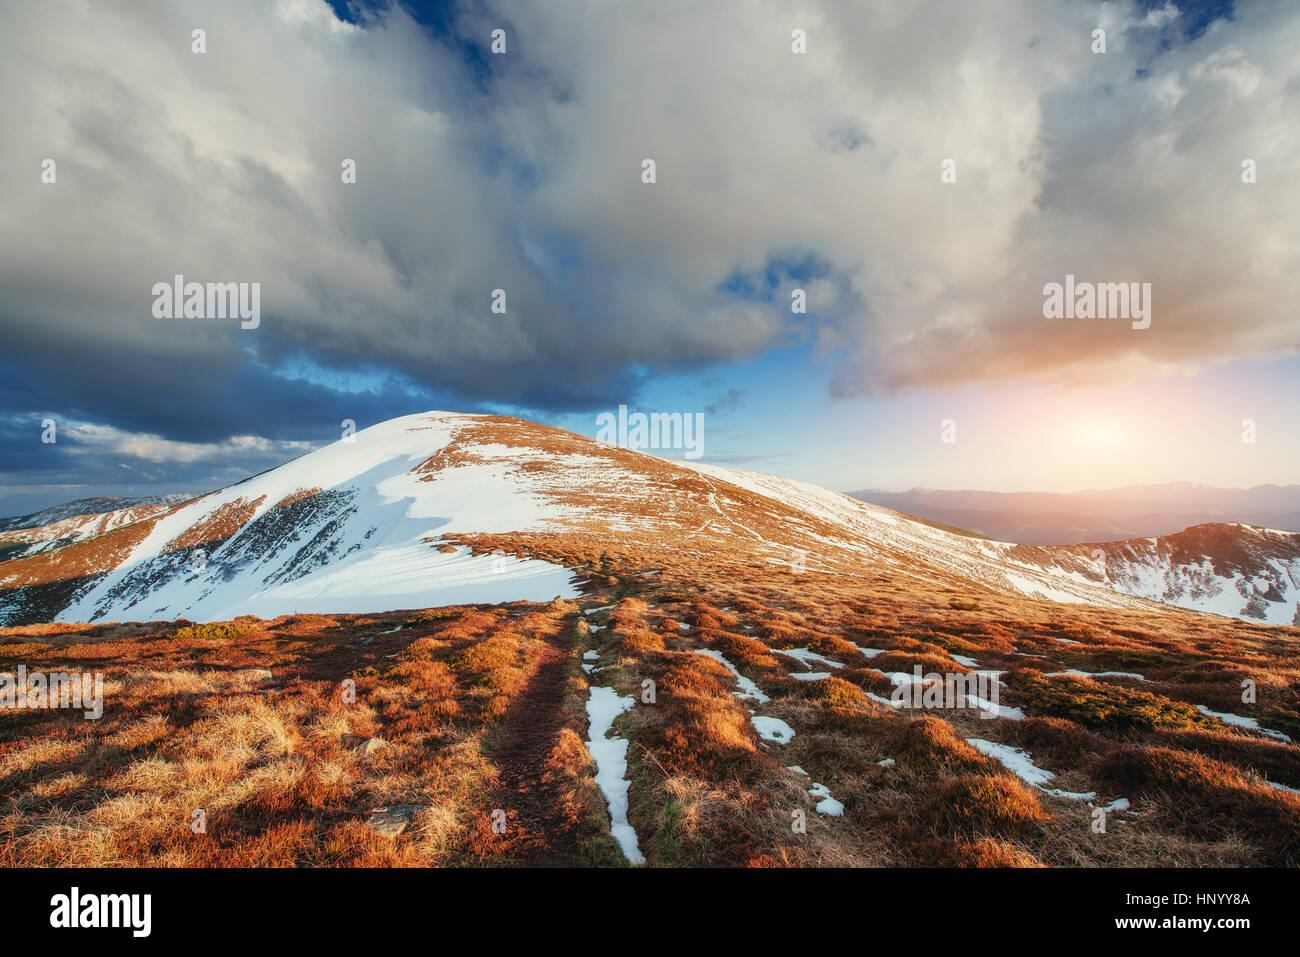 Primavera paisaje de montaña. Montañas nevadas Imagen De Stock